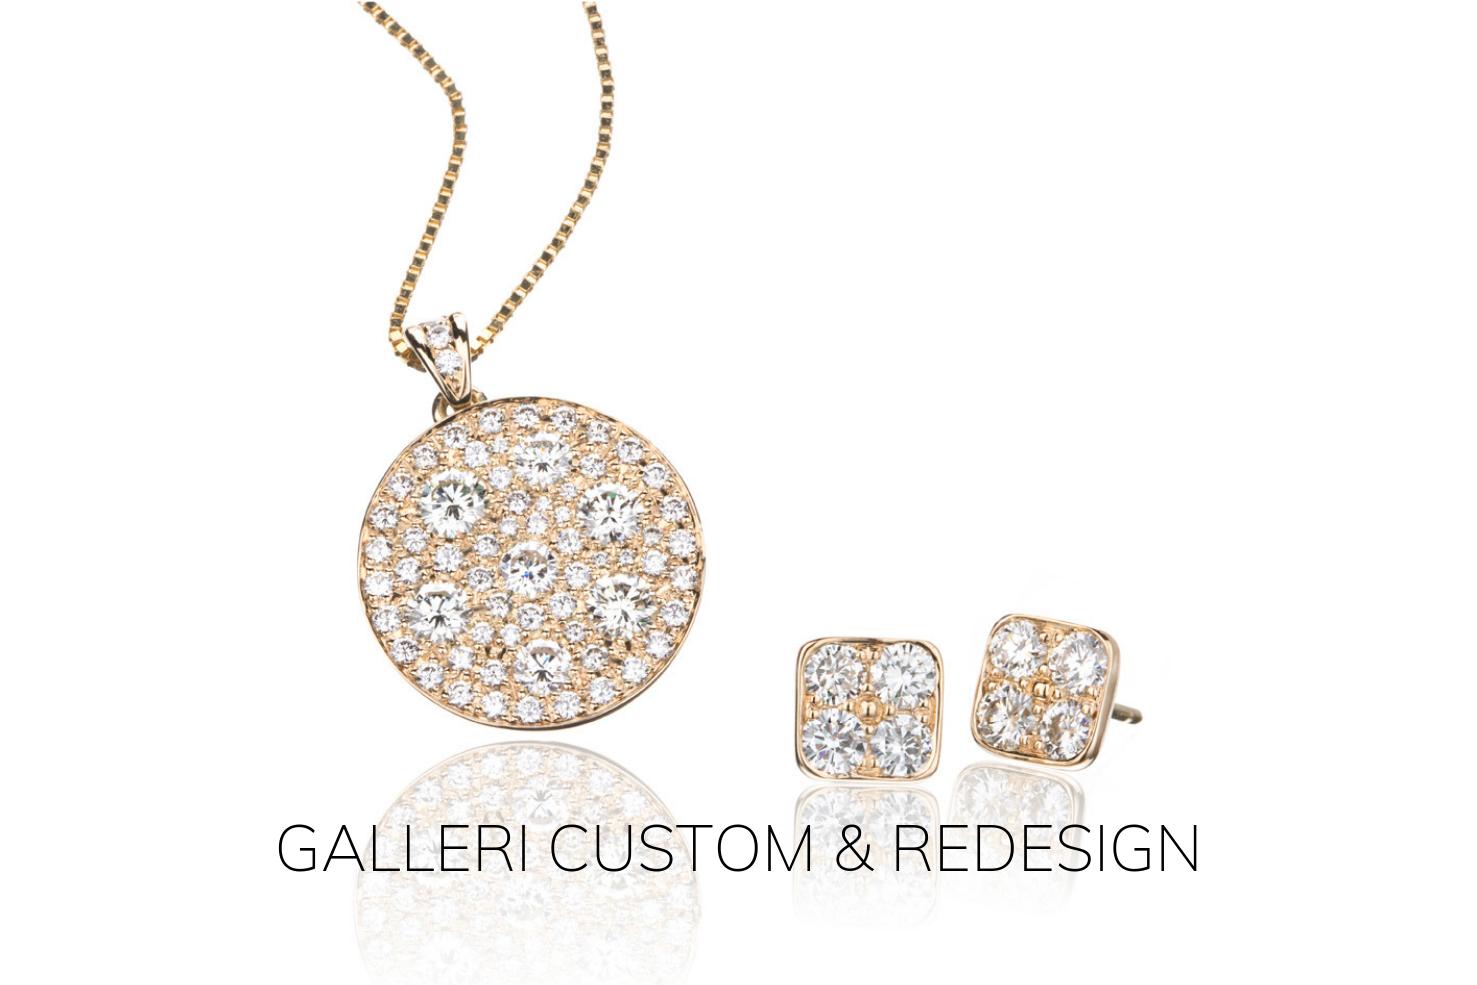 Galleri Custom og redesign